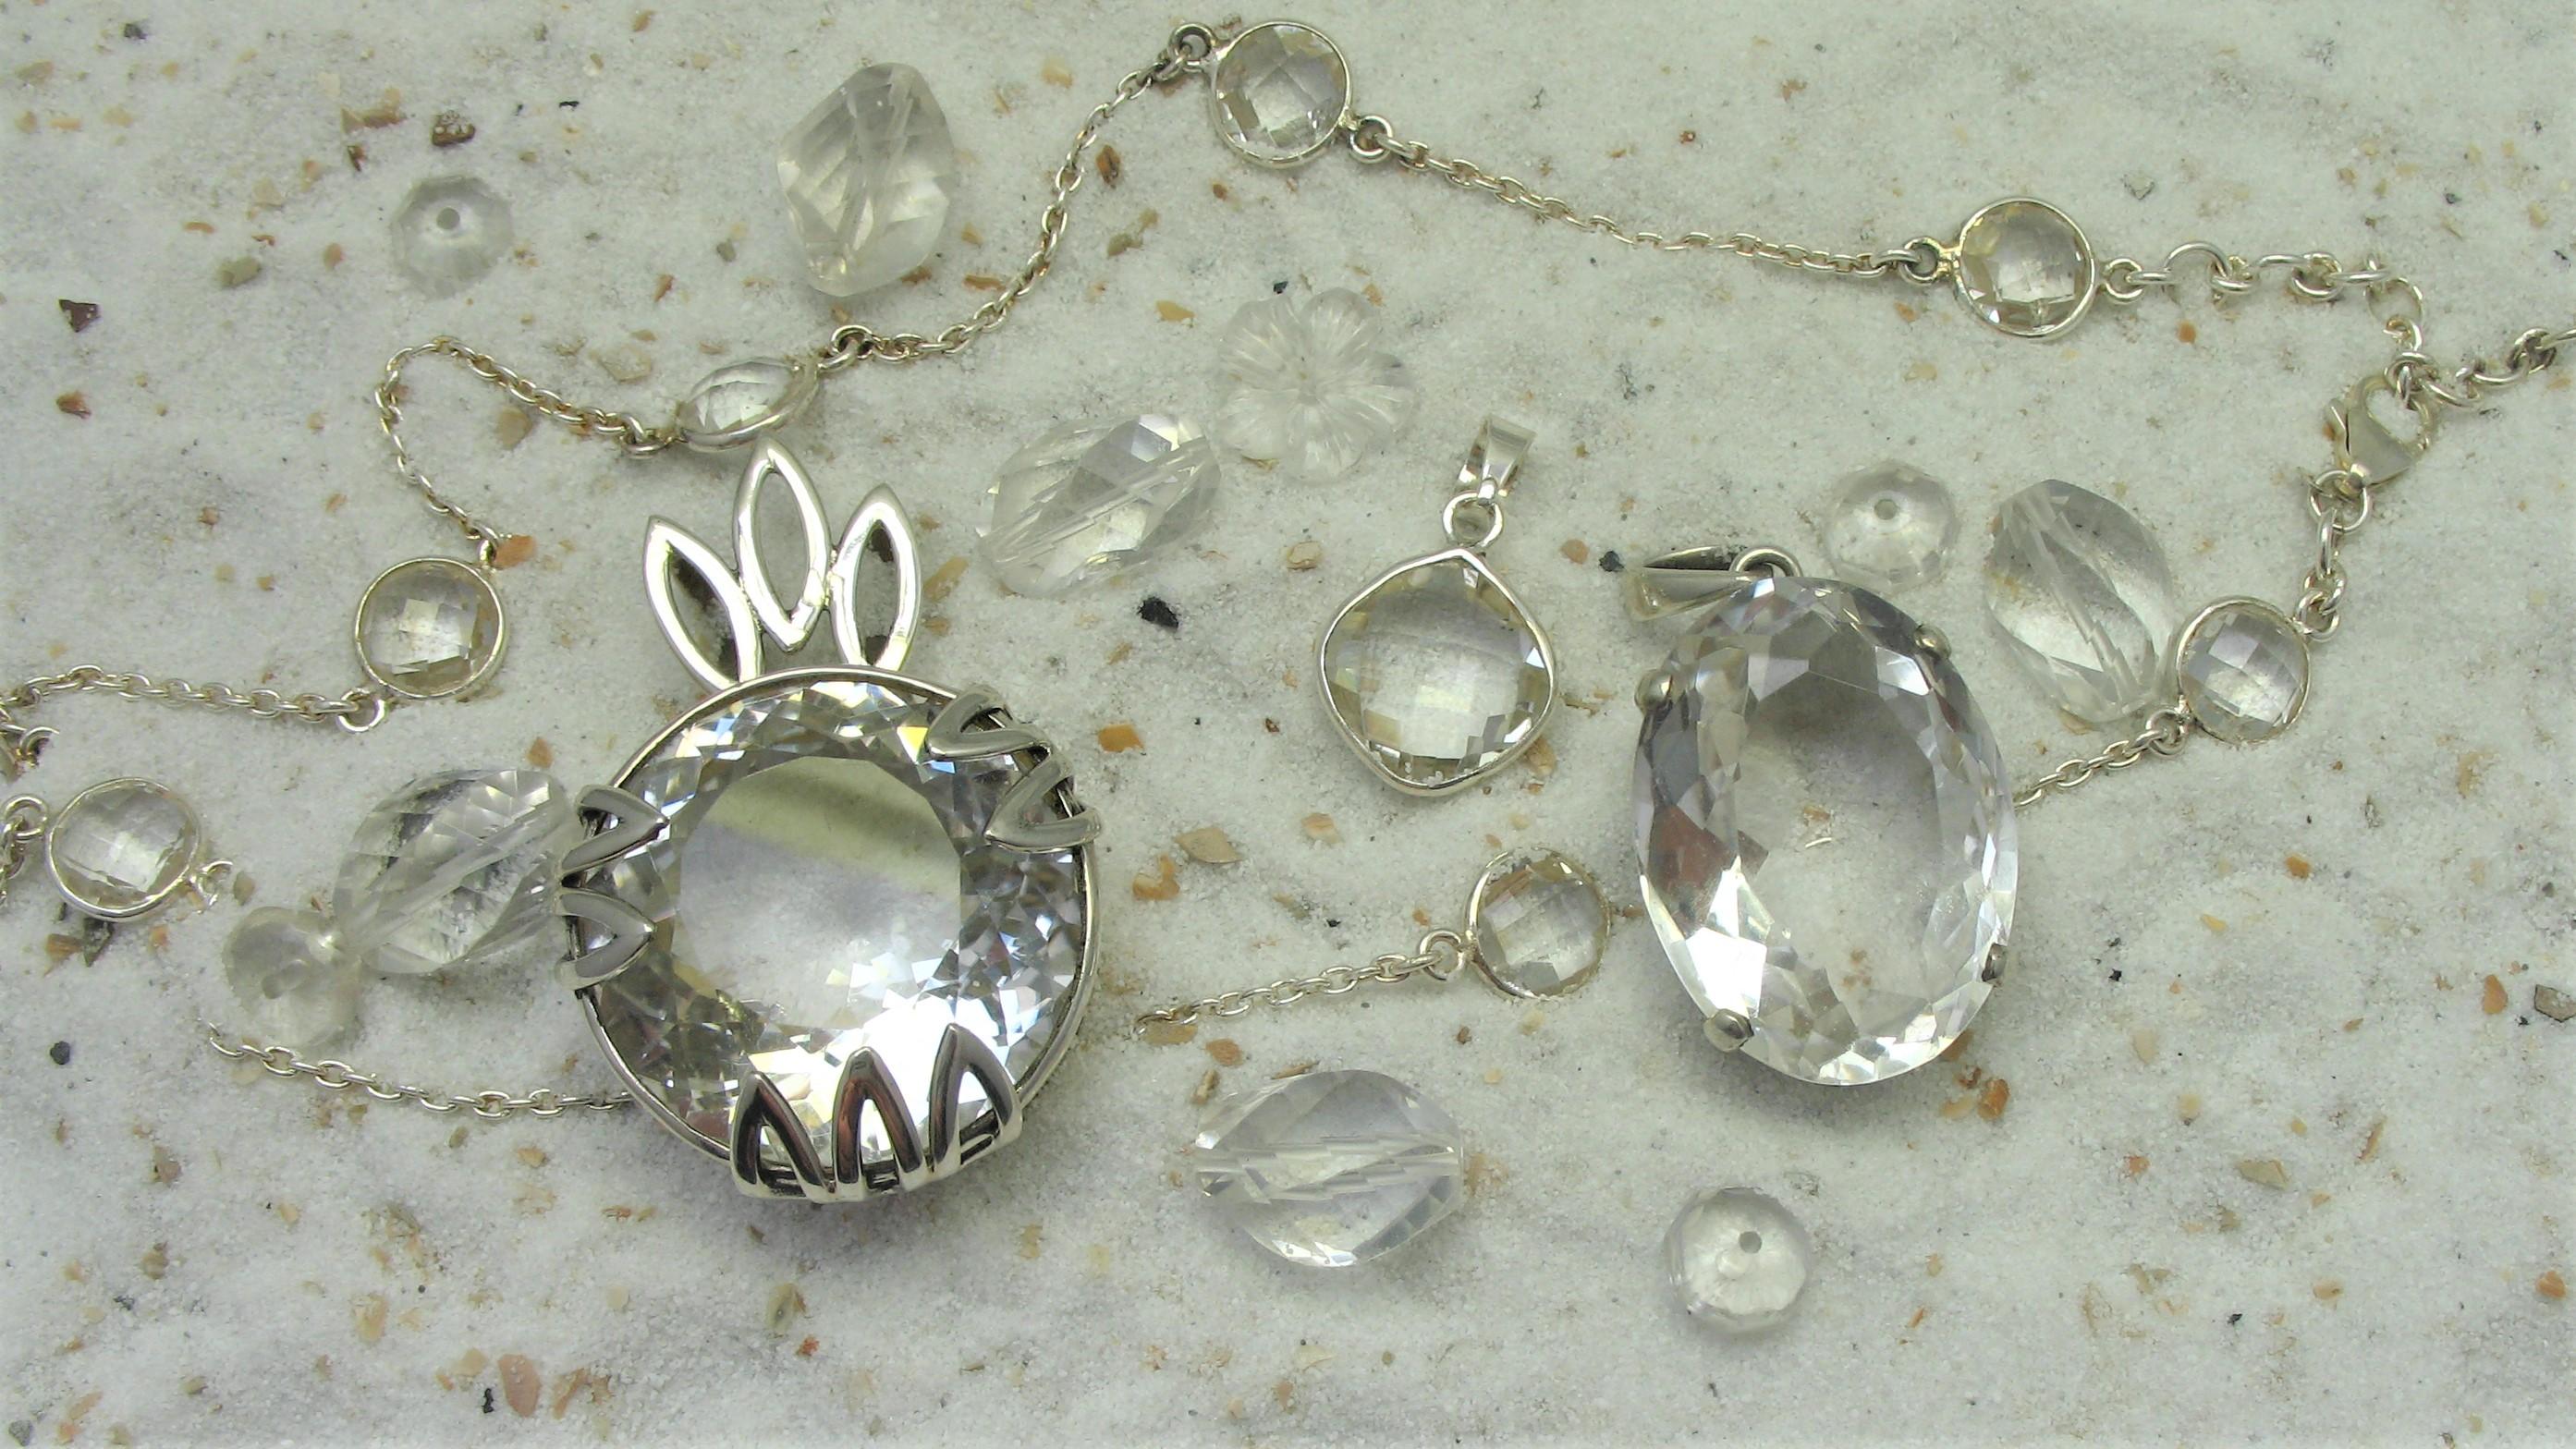 Bergkristal sieraden